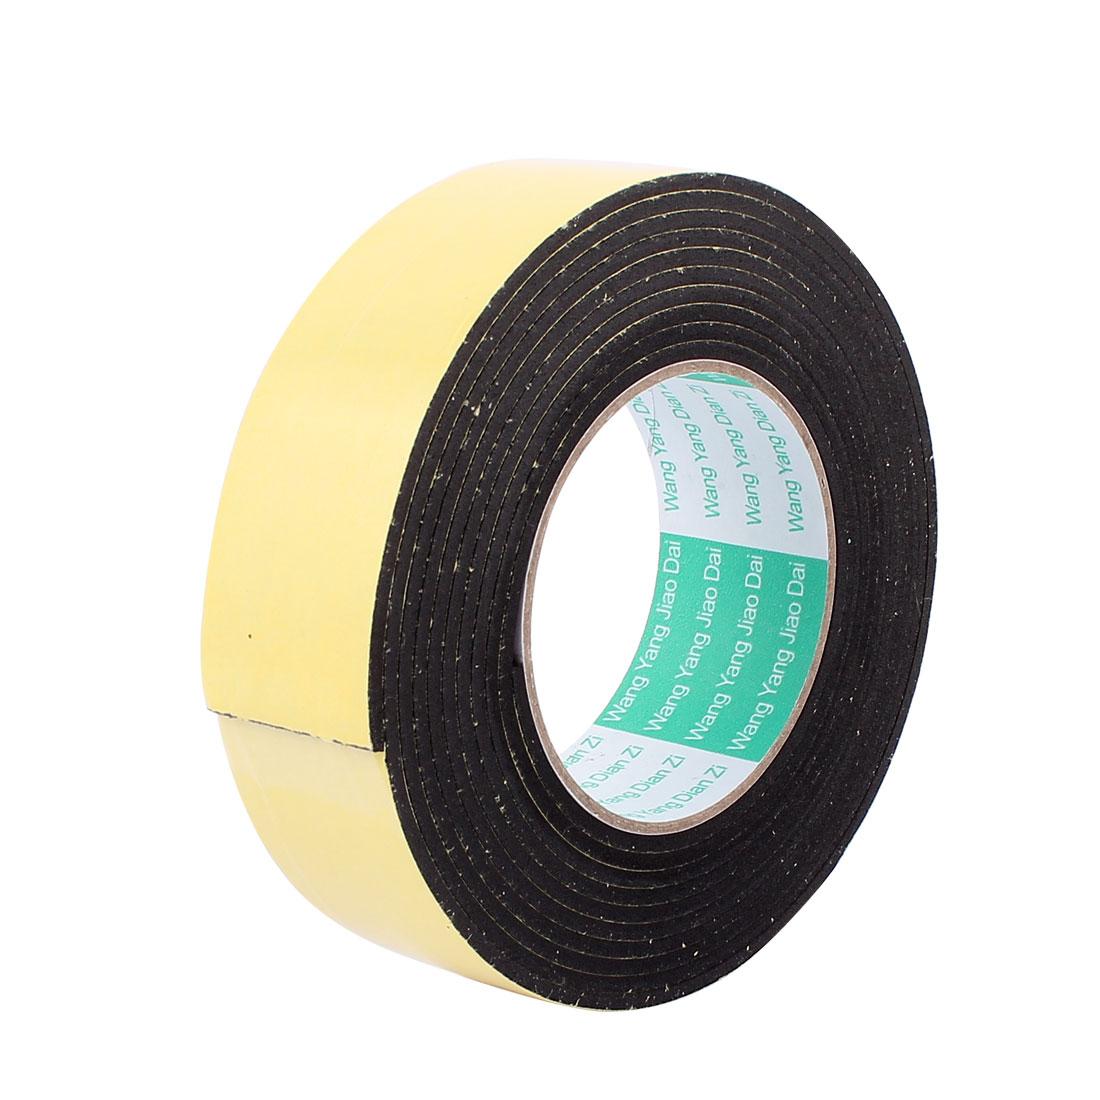 Black EVA 4CM Wide 4M Length 3MM Thick Single Sided Shockproof Sponge Tape